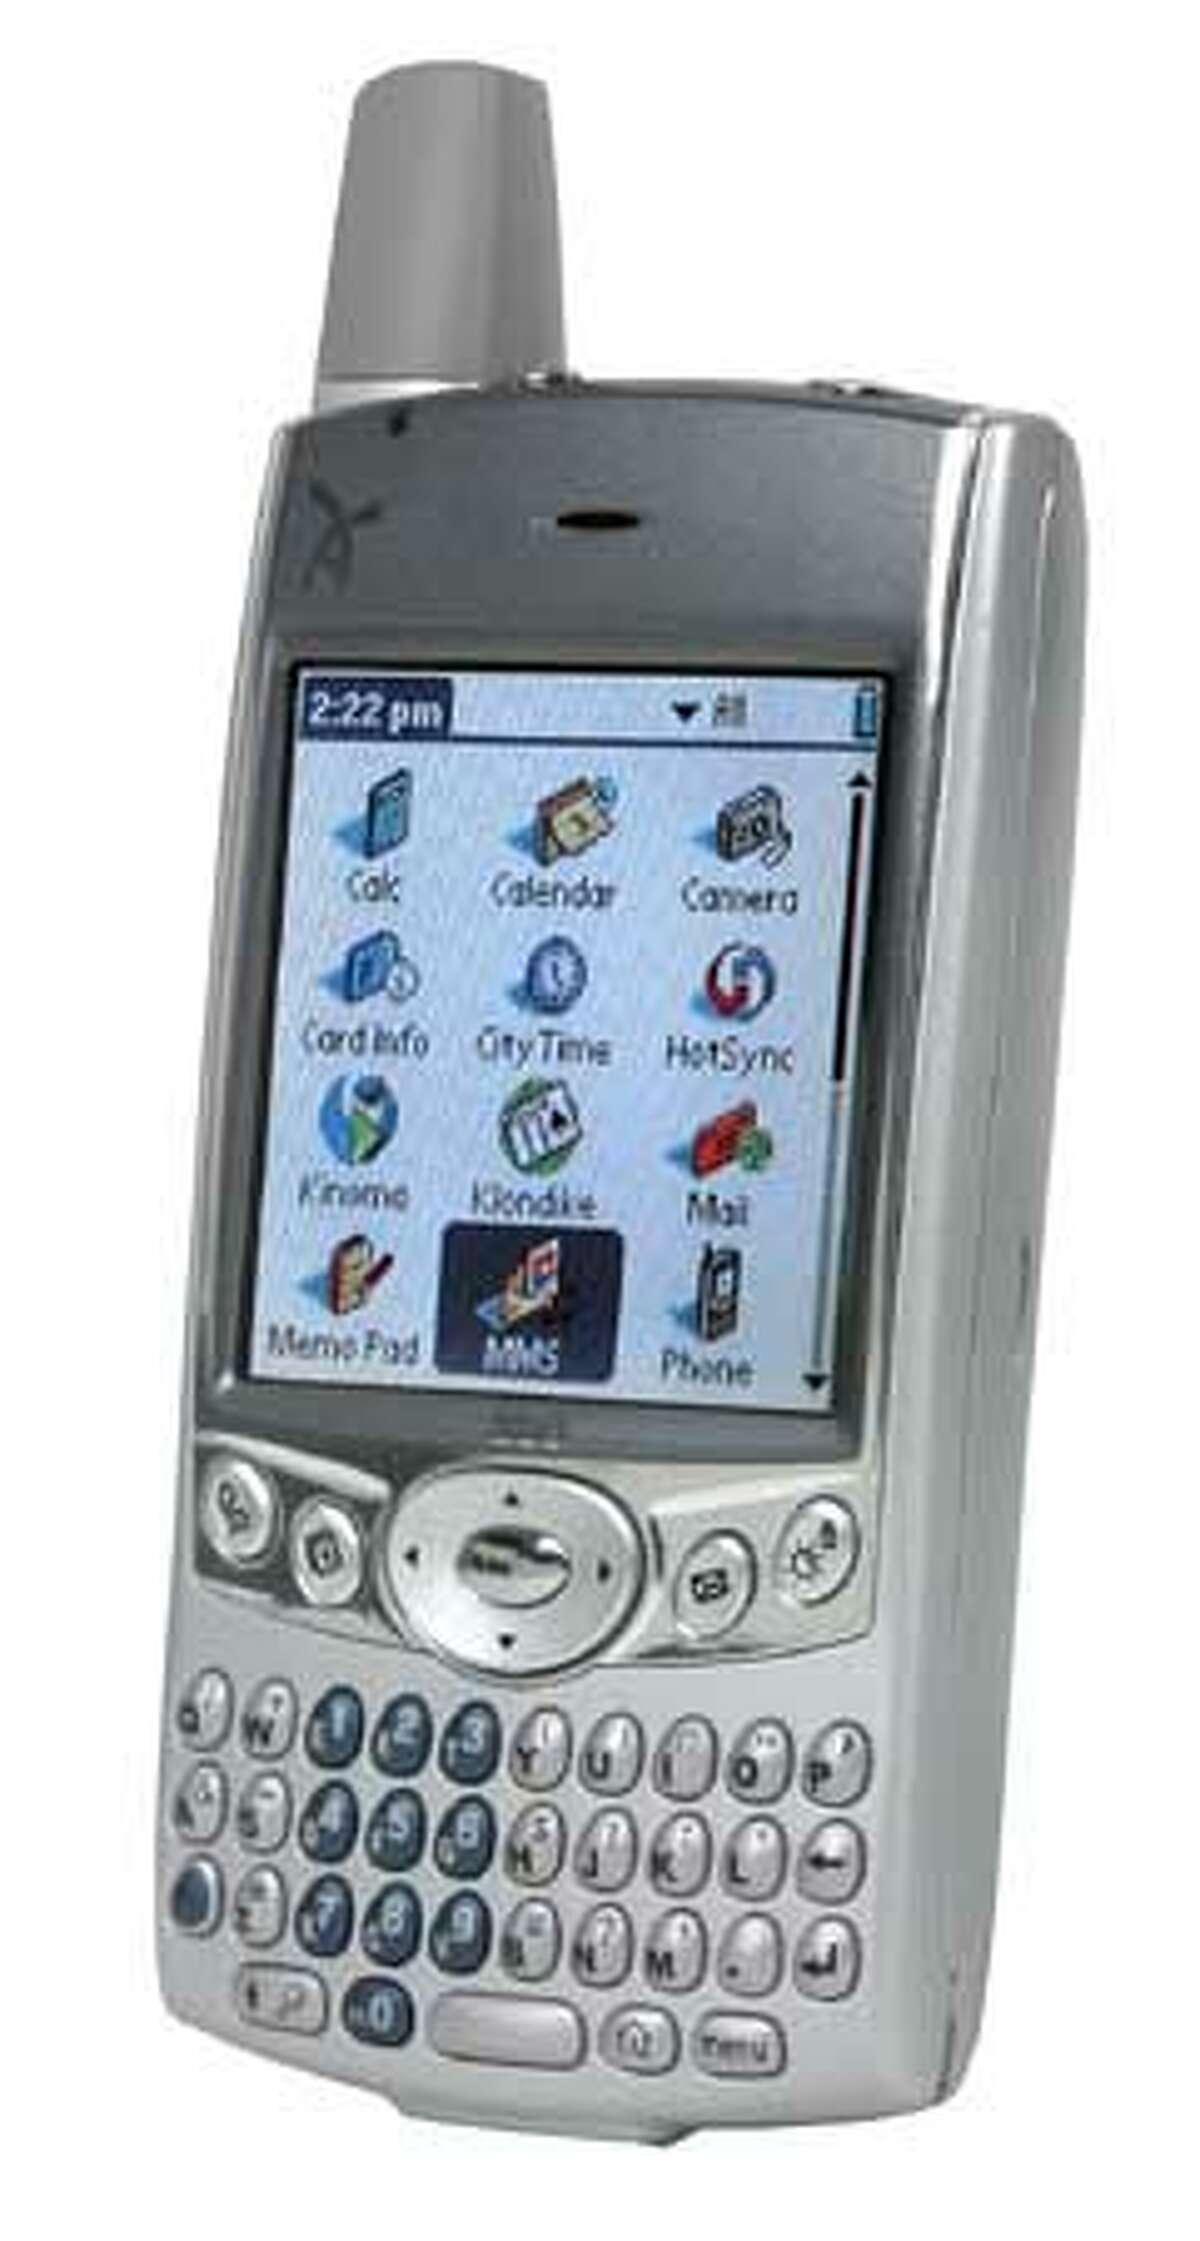 Handspring Treo 600 GSM / Smart Phones for 9/27